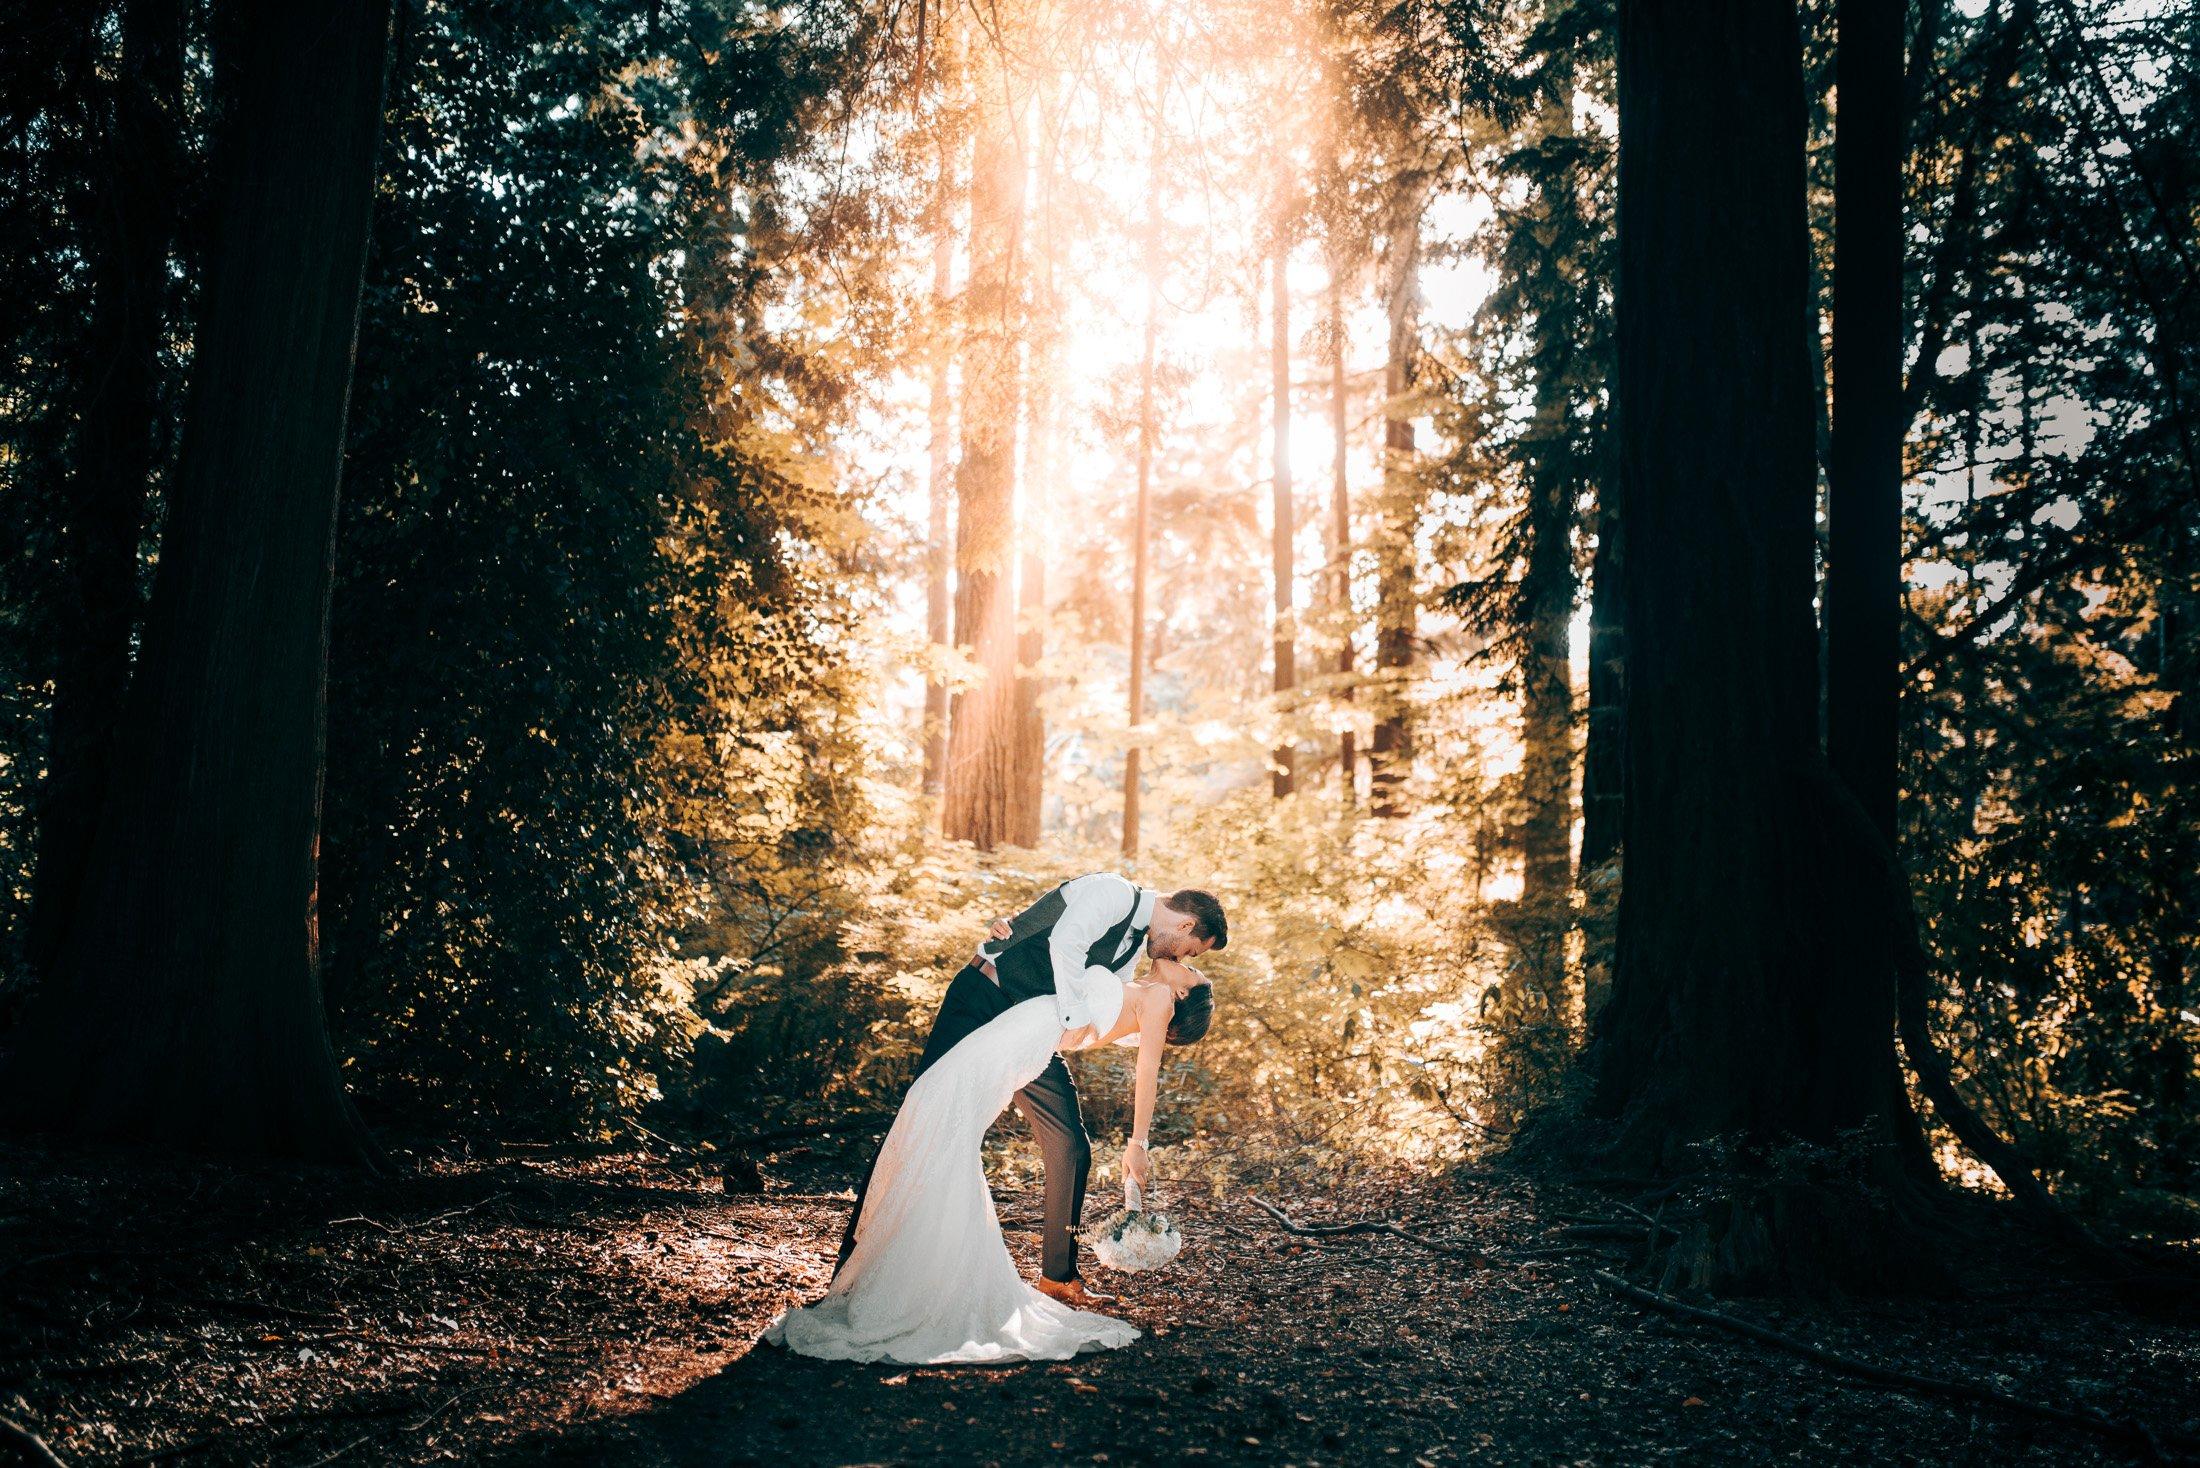 012-forest-wedding-photos.jpg